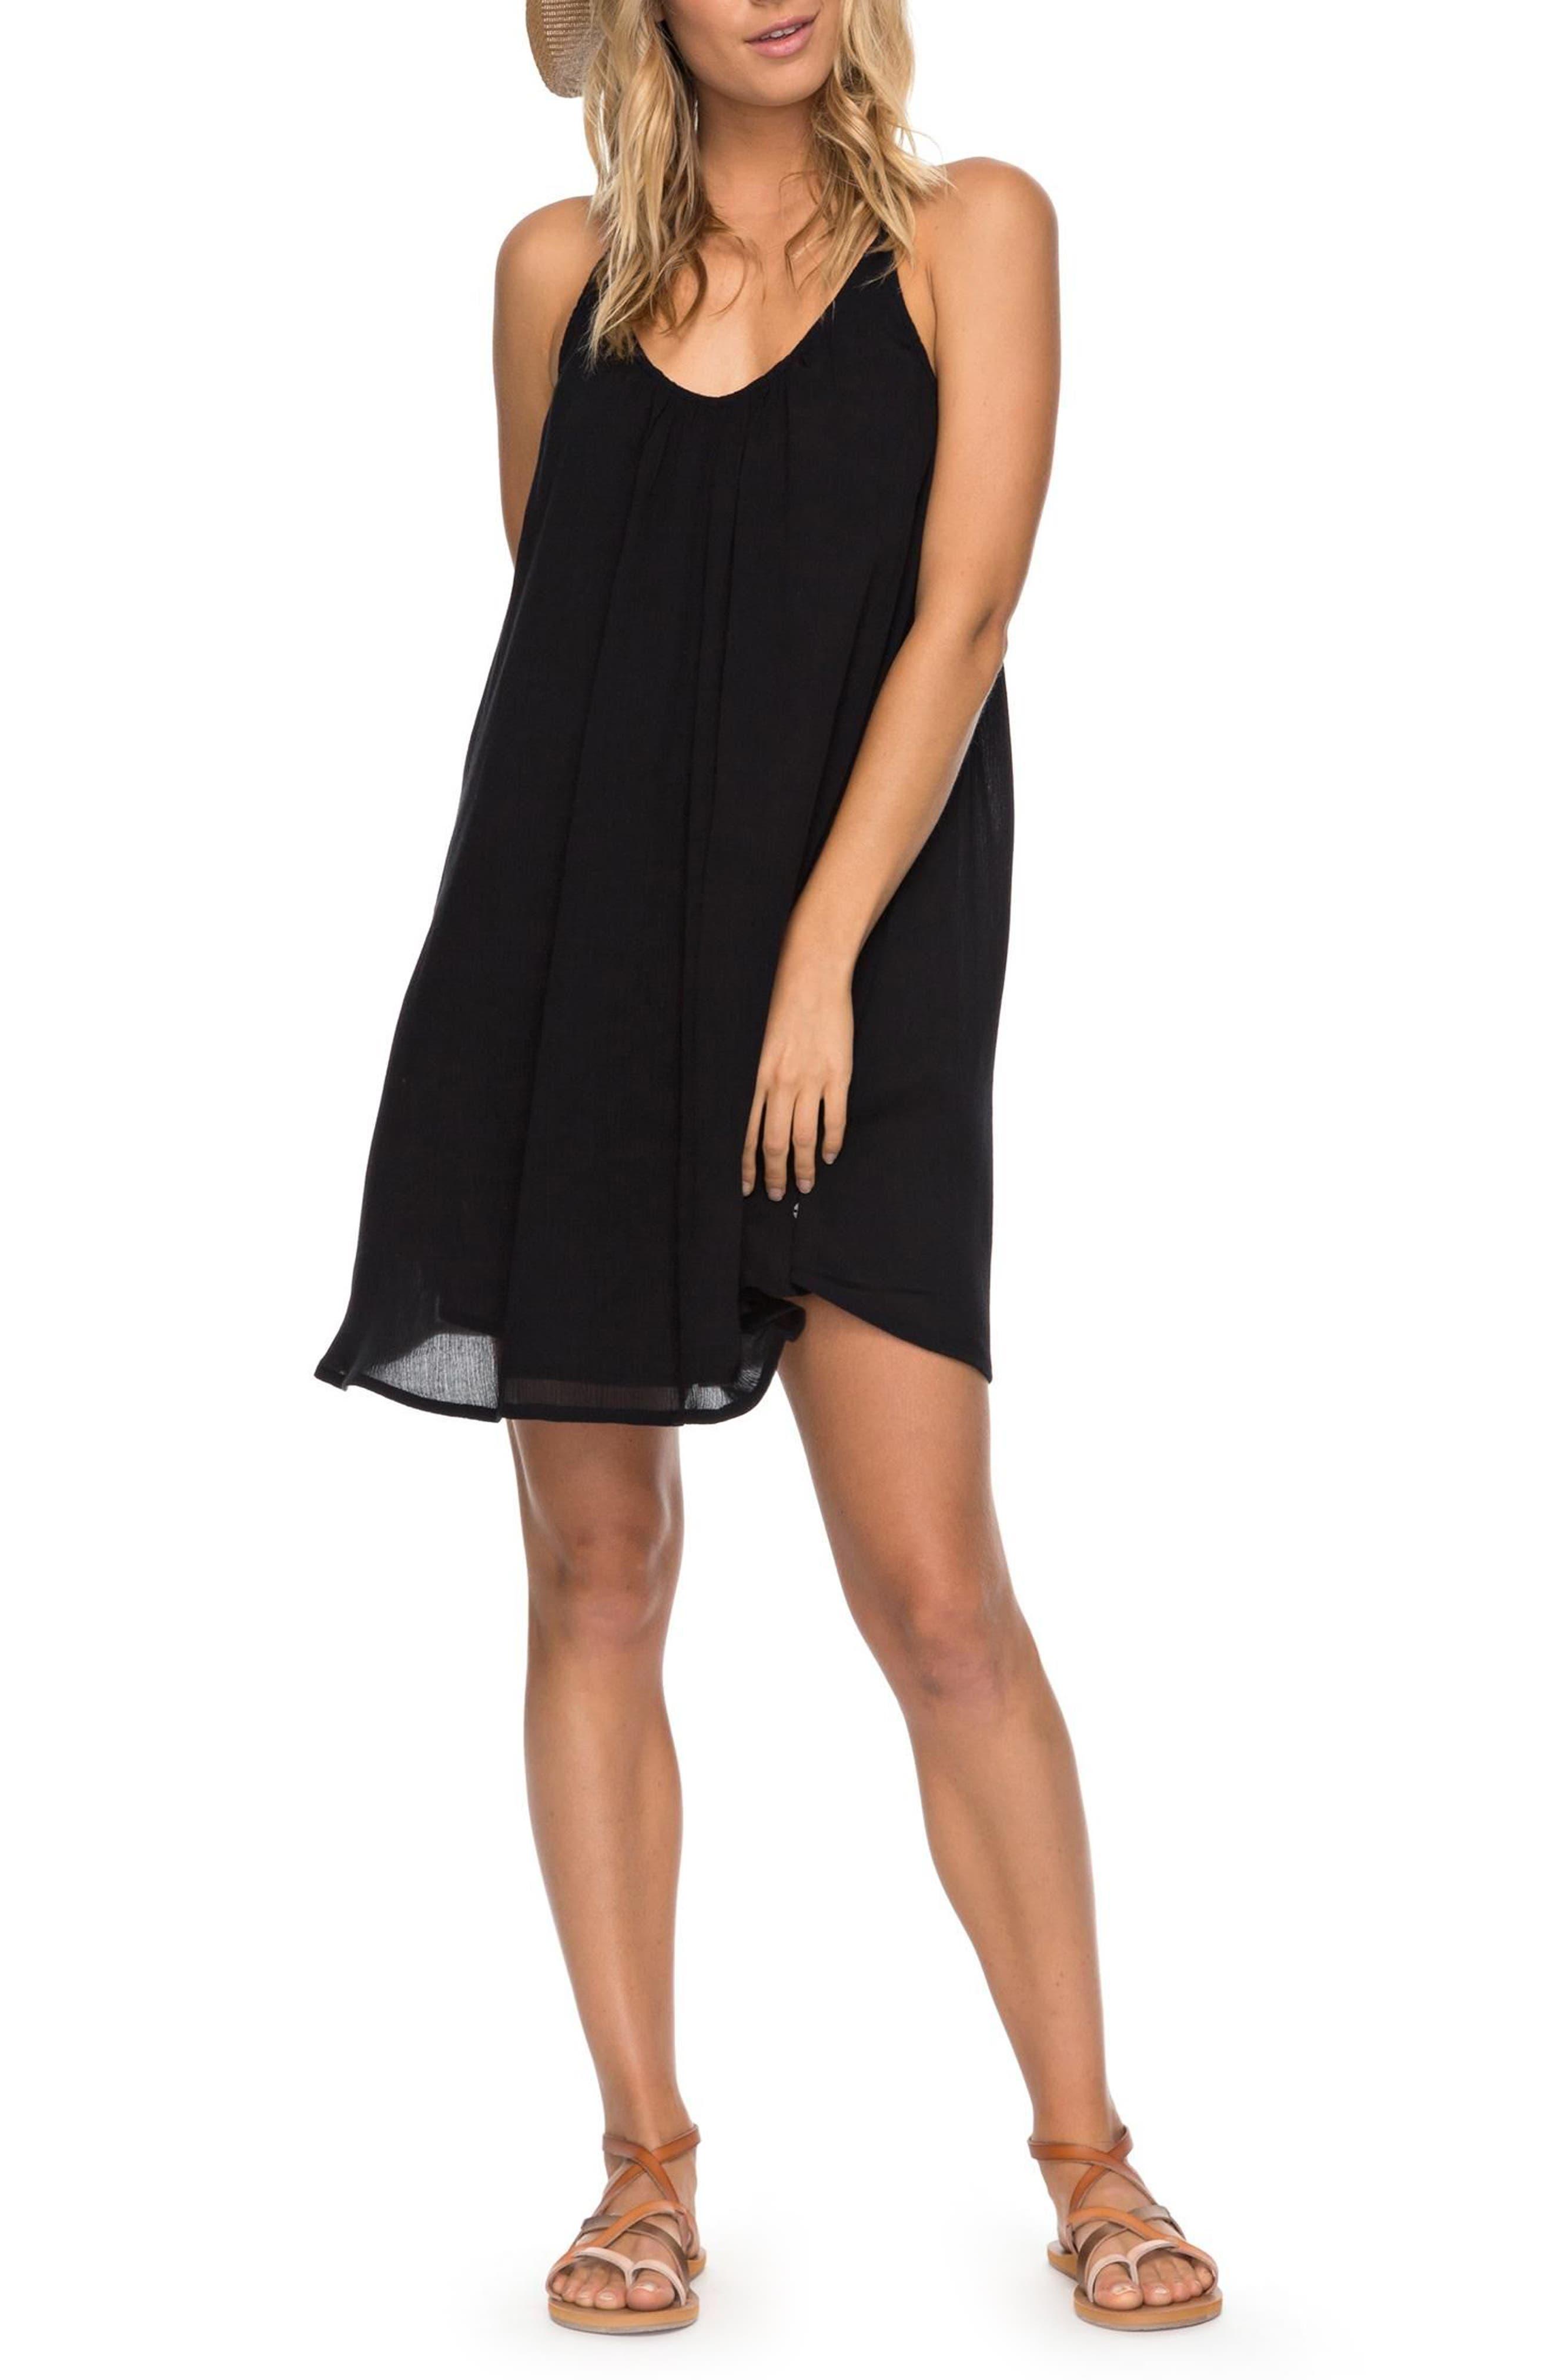 Roxy Great Intentions Trapeze Dress